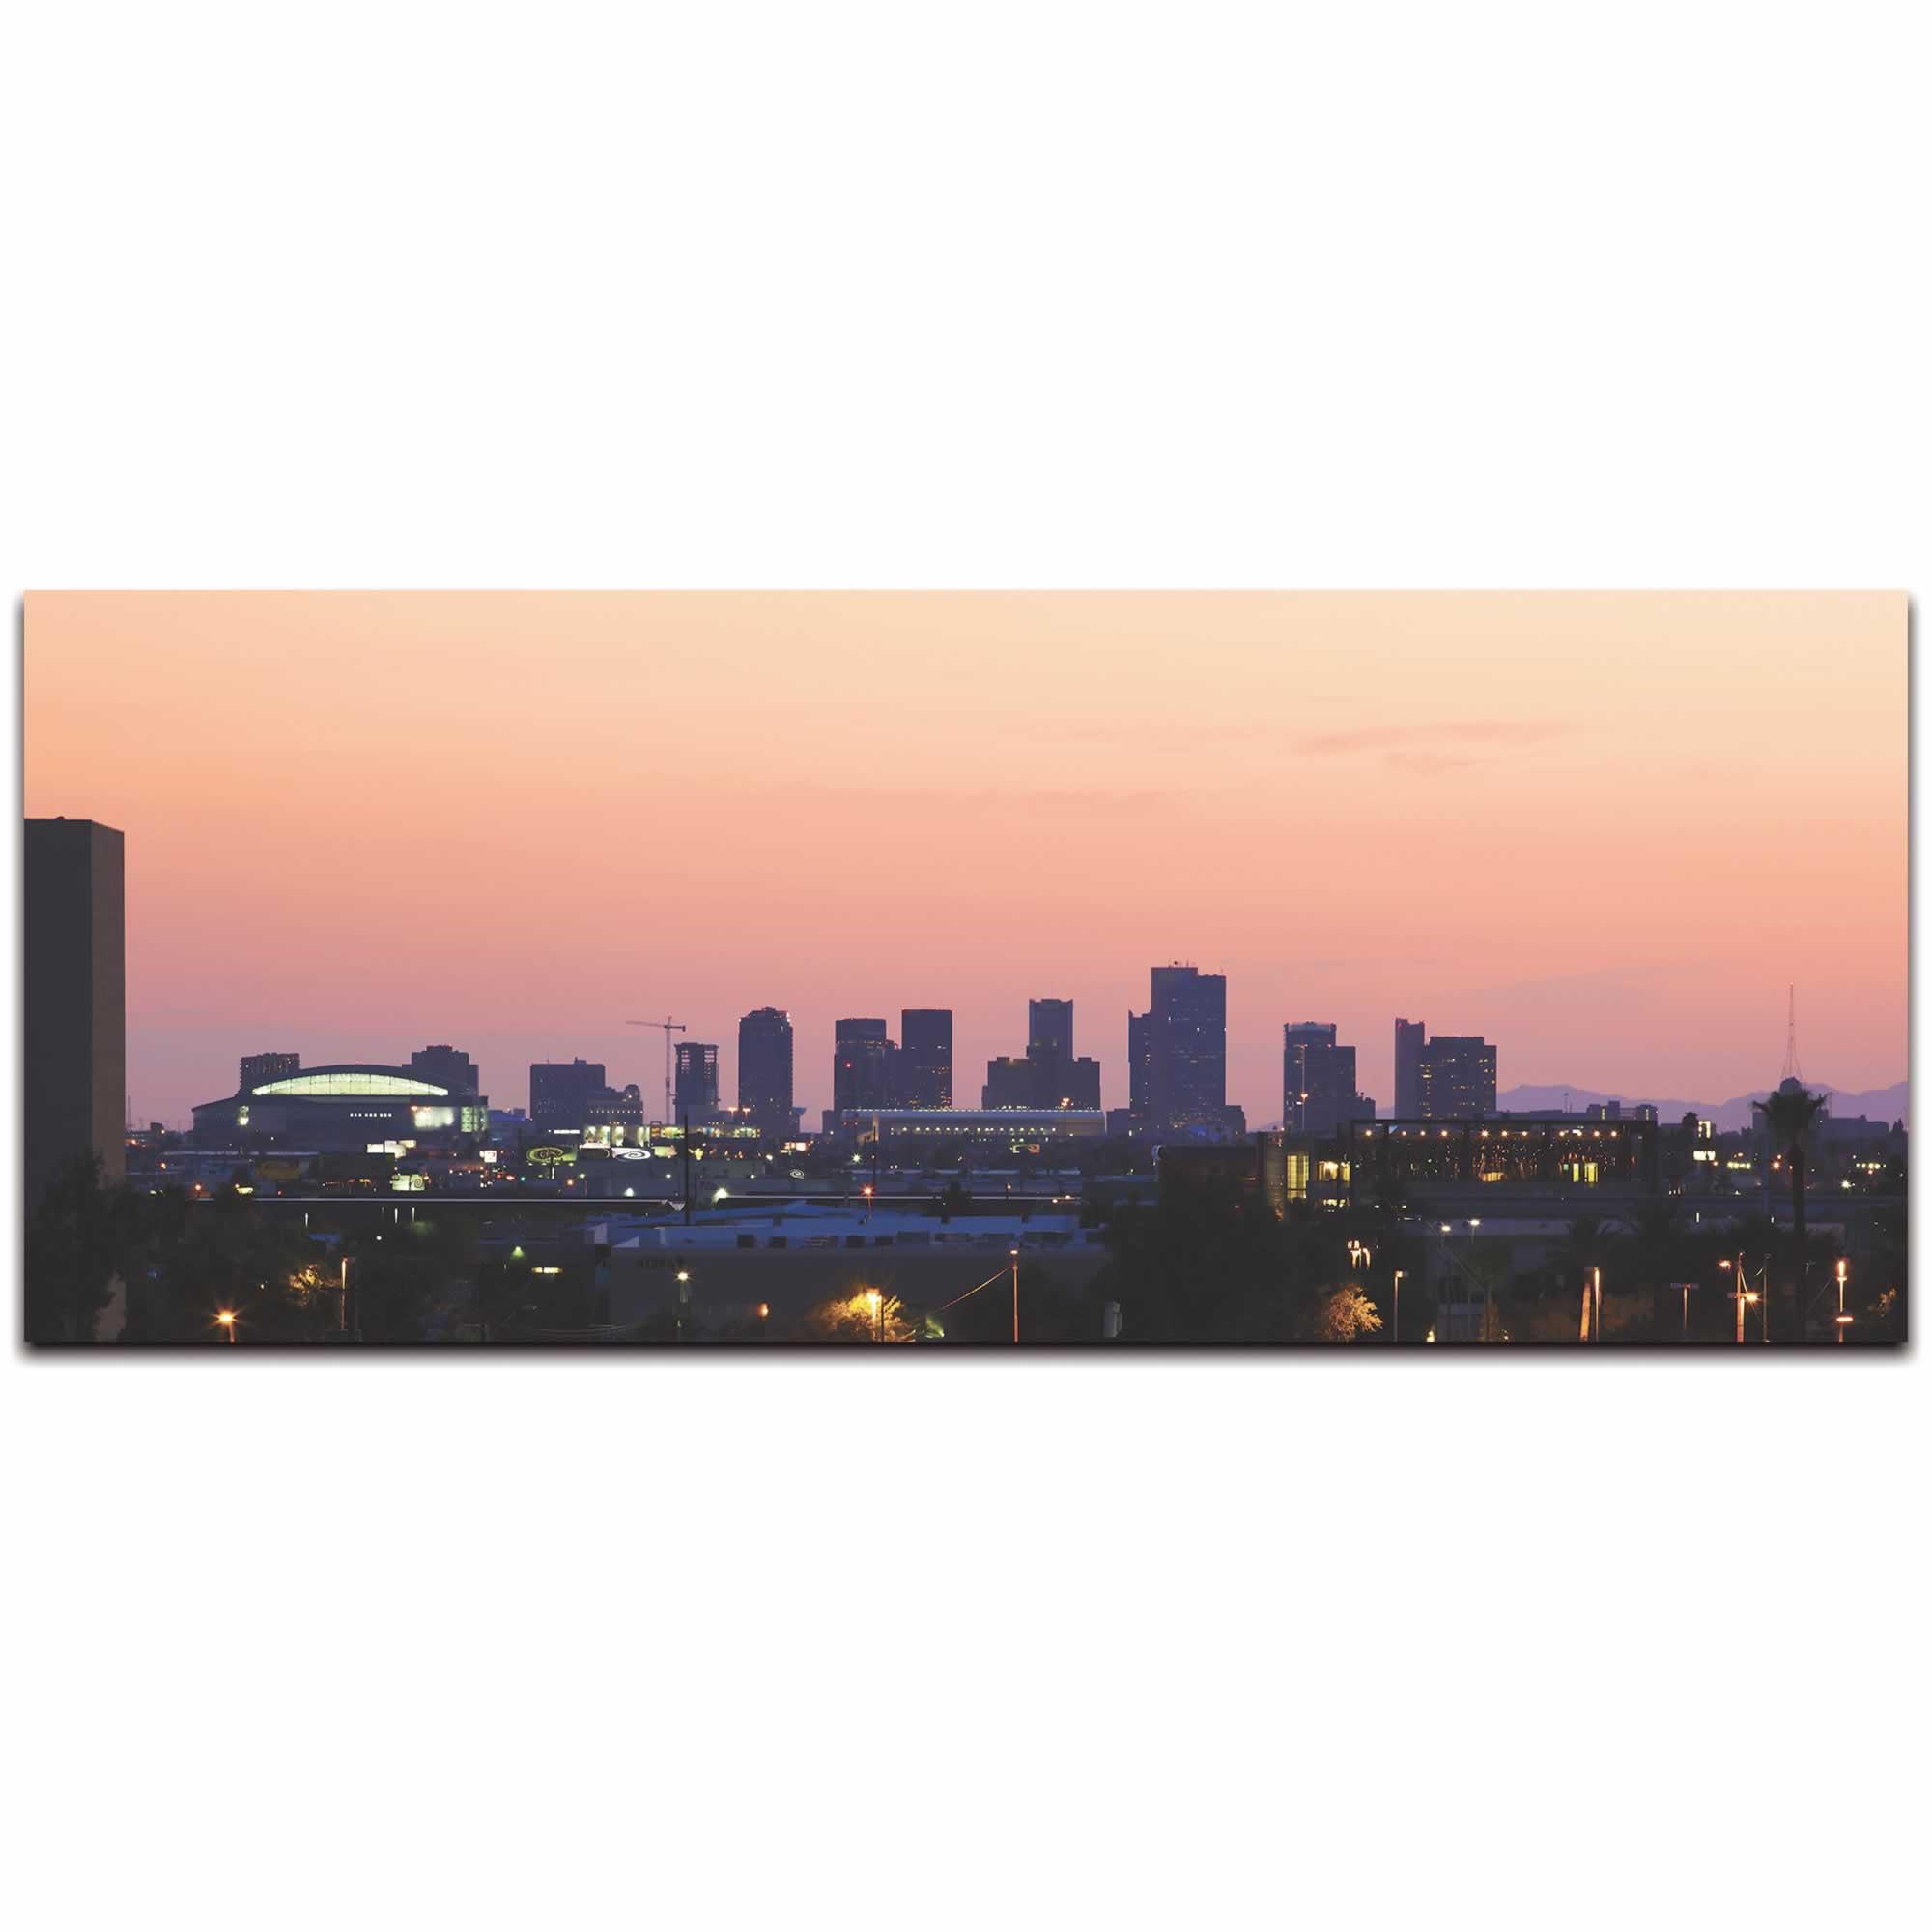 Phoenix City Skyline - Urban Modern Art, Designer Home Decor, Cityscape Wall Artwork, Trendy Contemporary Art - Alternate View 2